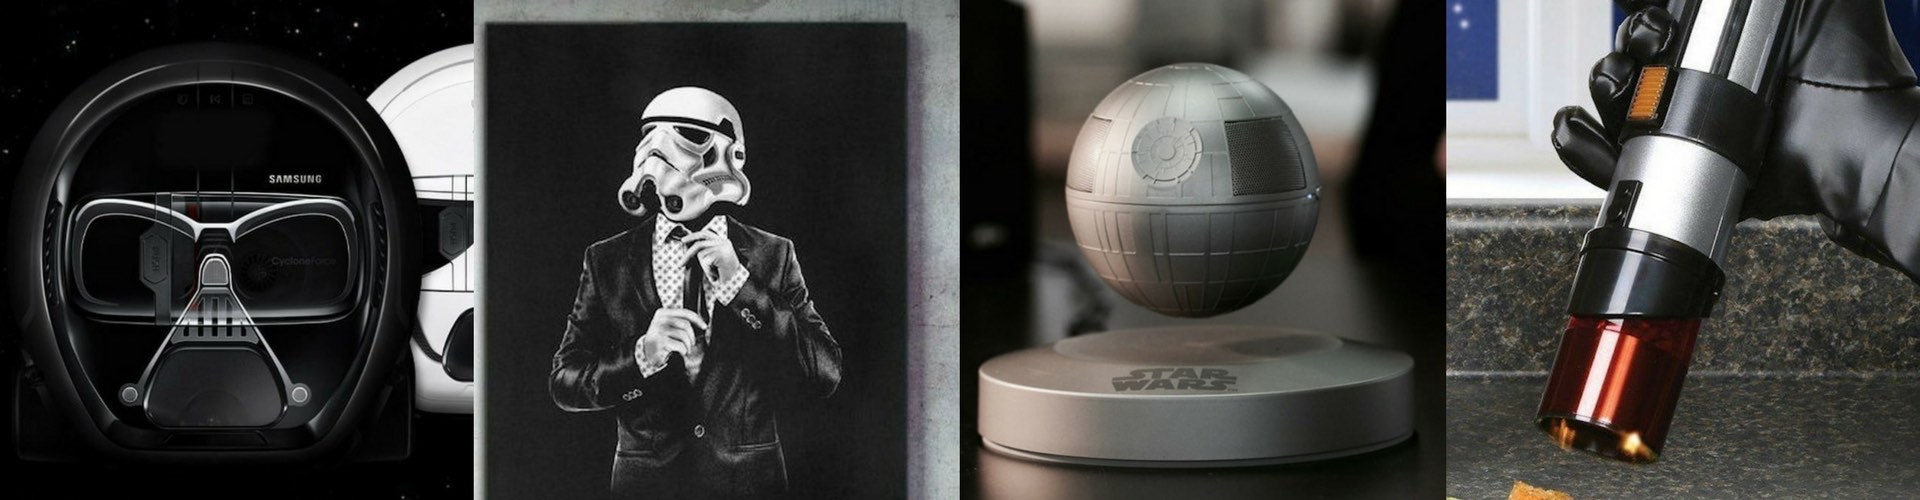 12 Star Wars gadgets to awaken the geek inside you